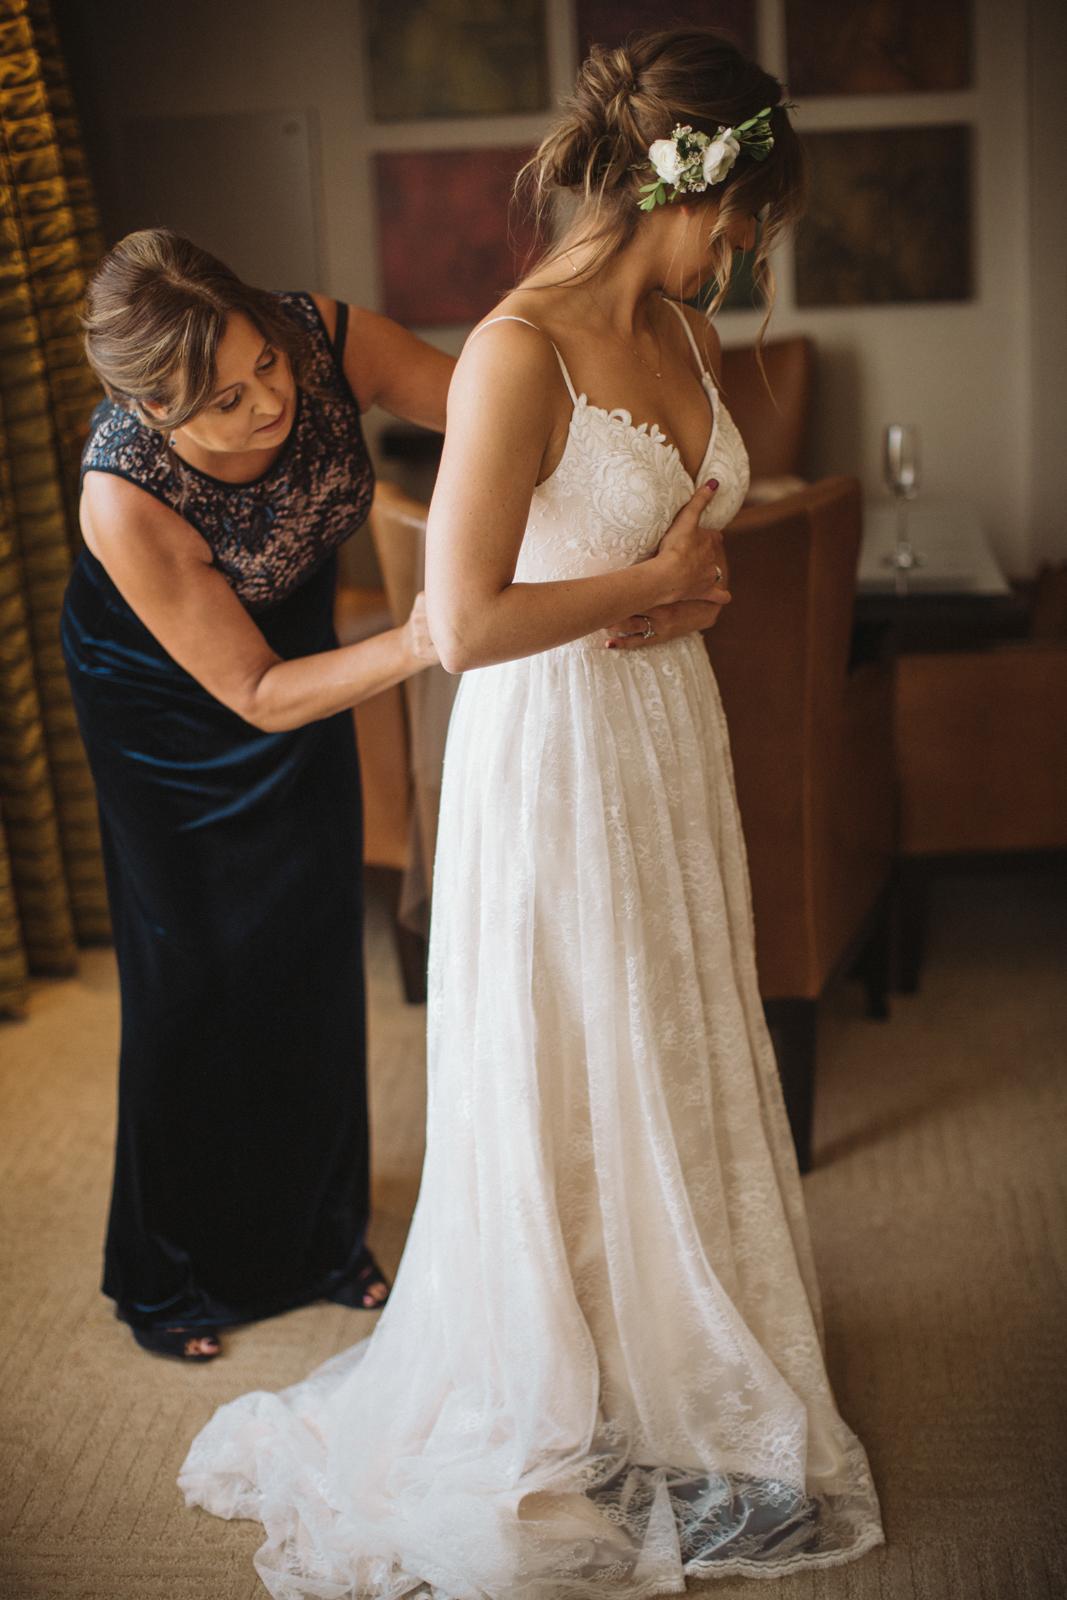 BeanandCole.com-Chris&JackieJohnson-Wedding-1014.jpg